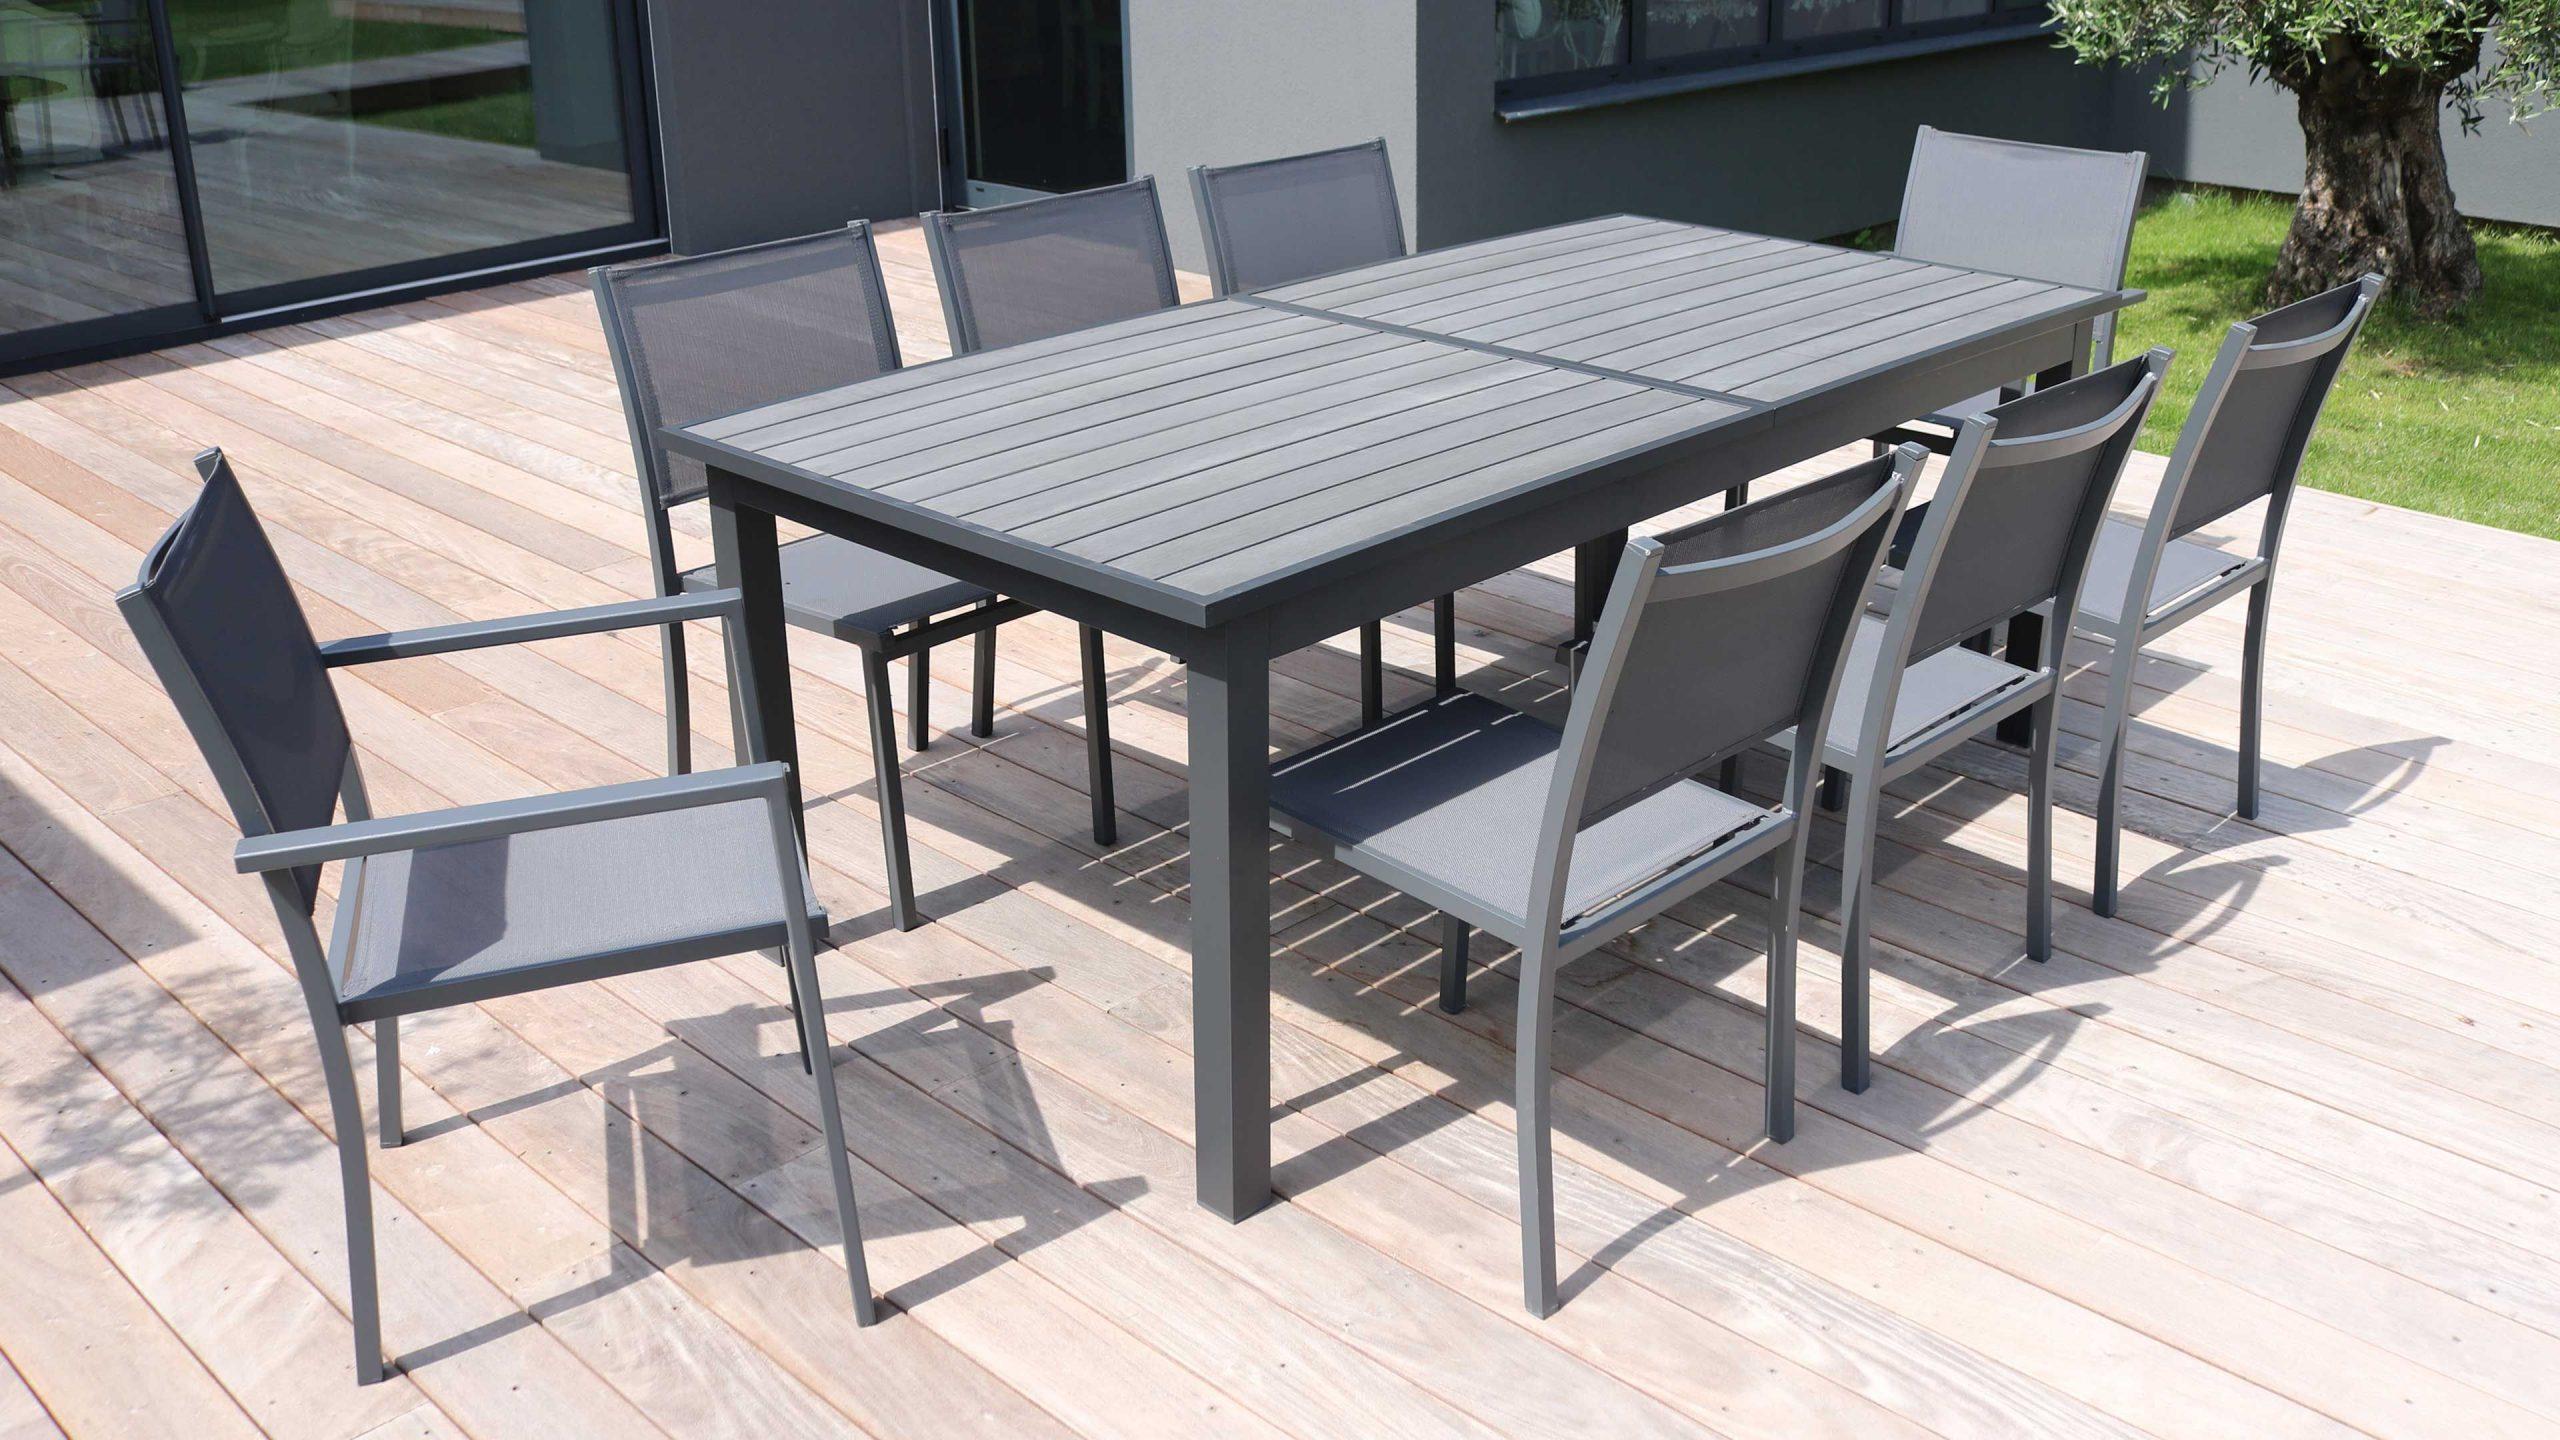 Grande Table De Jardin Extensible Aluminium Et Bois Composite tout Table De Jardin Aluminium Et Composite